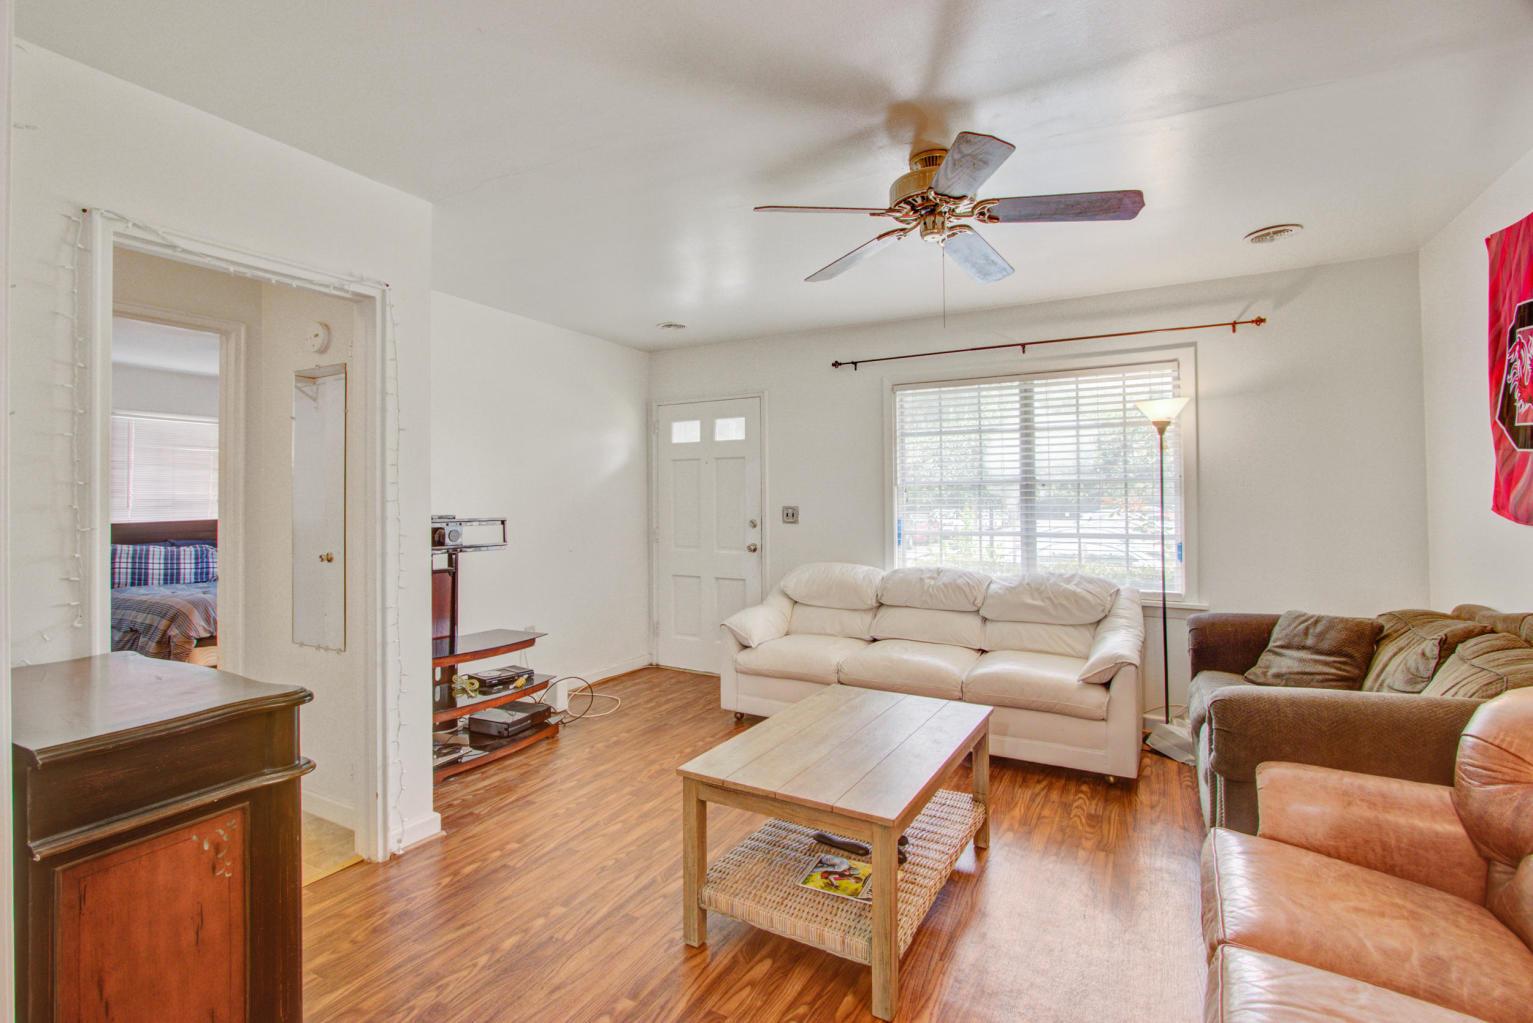 Rutledge Green Condos For Sale - 173 Rutledge, Charleston, SC - 21